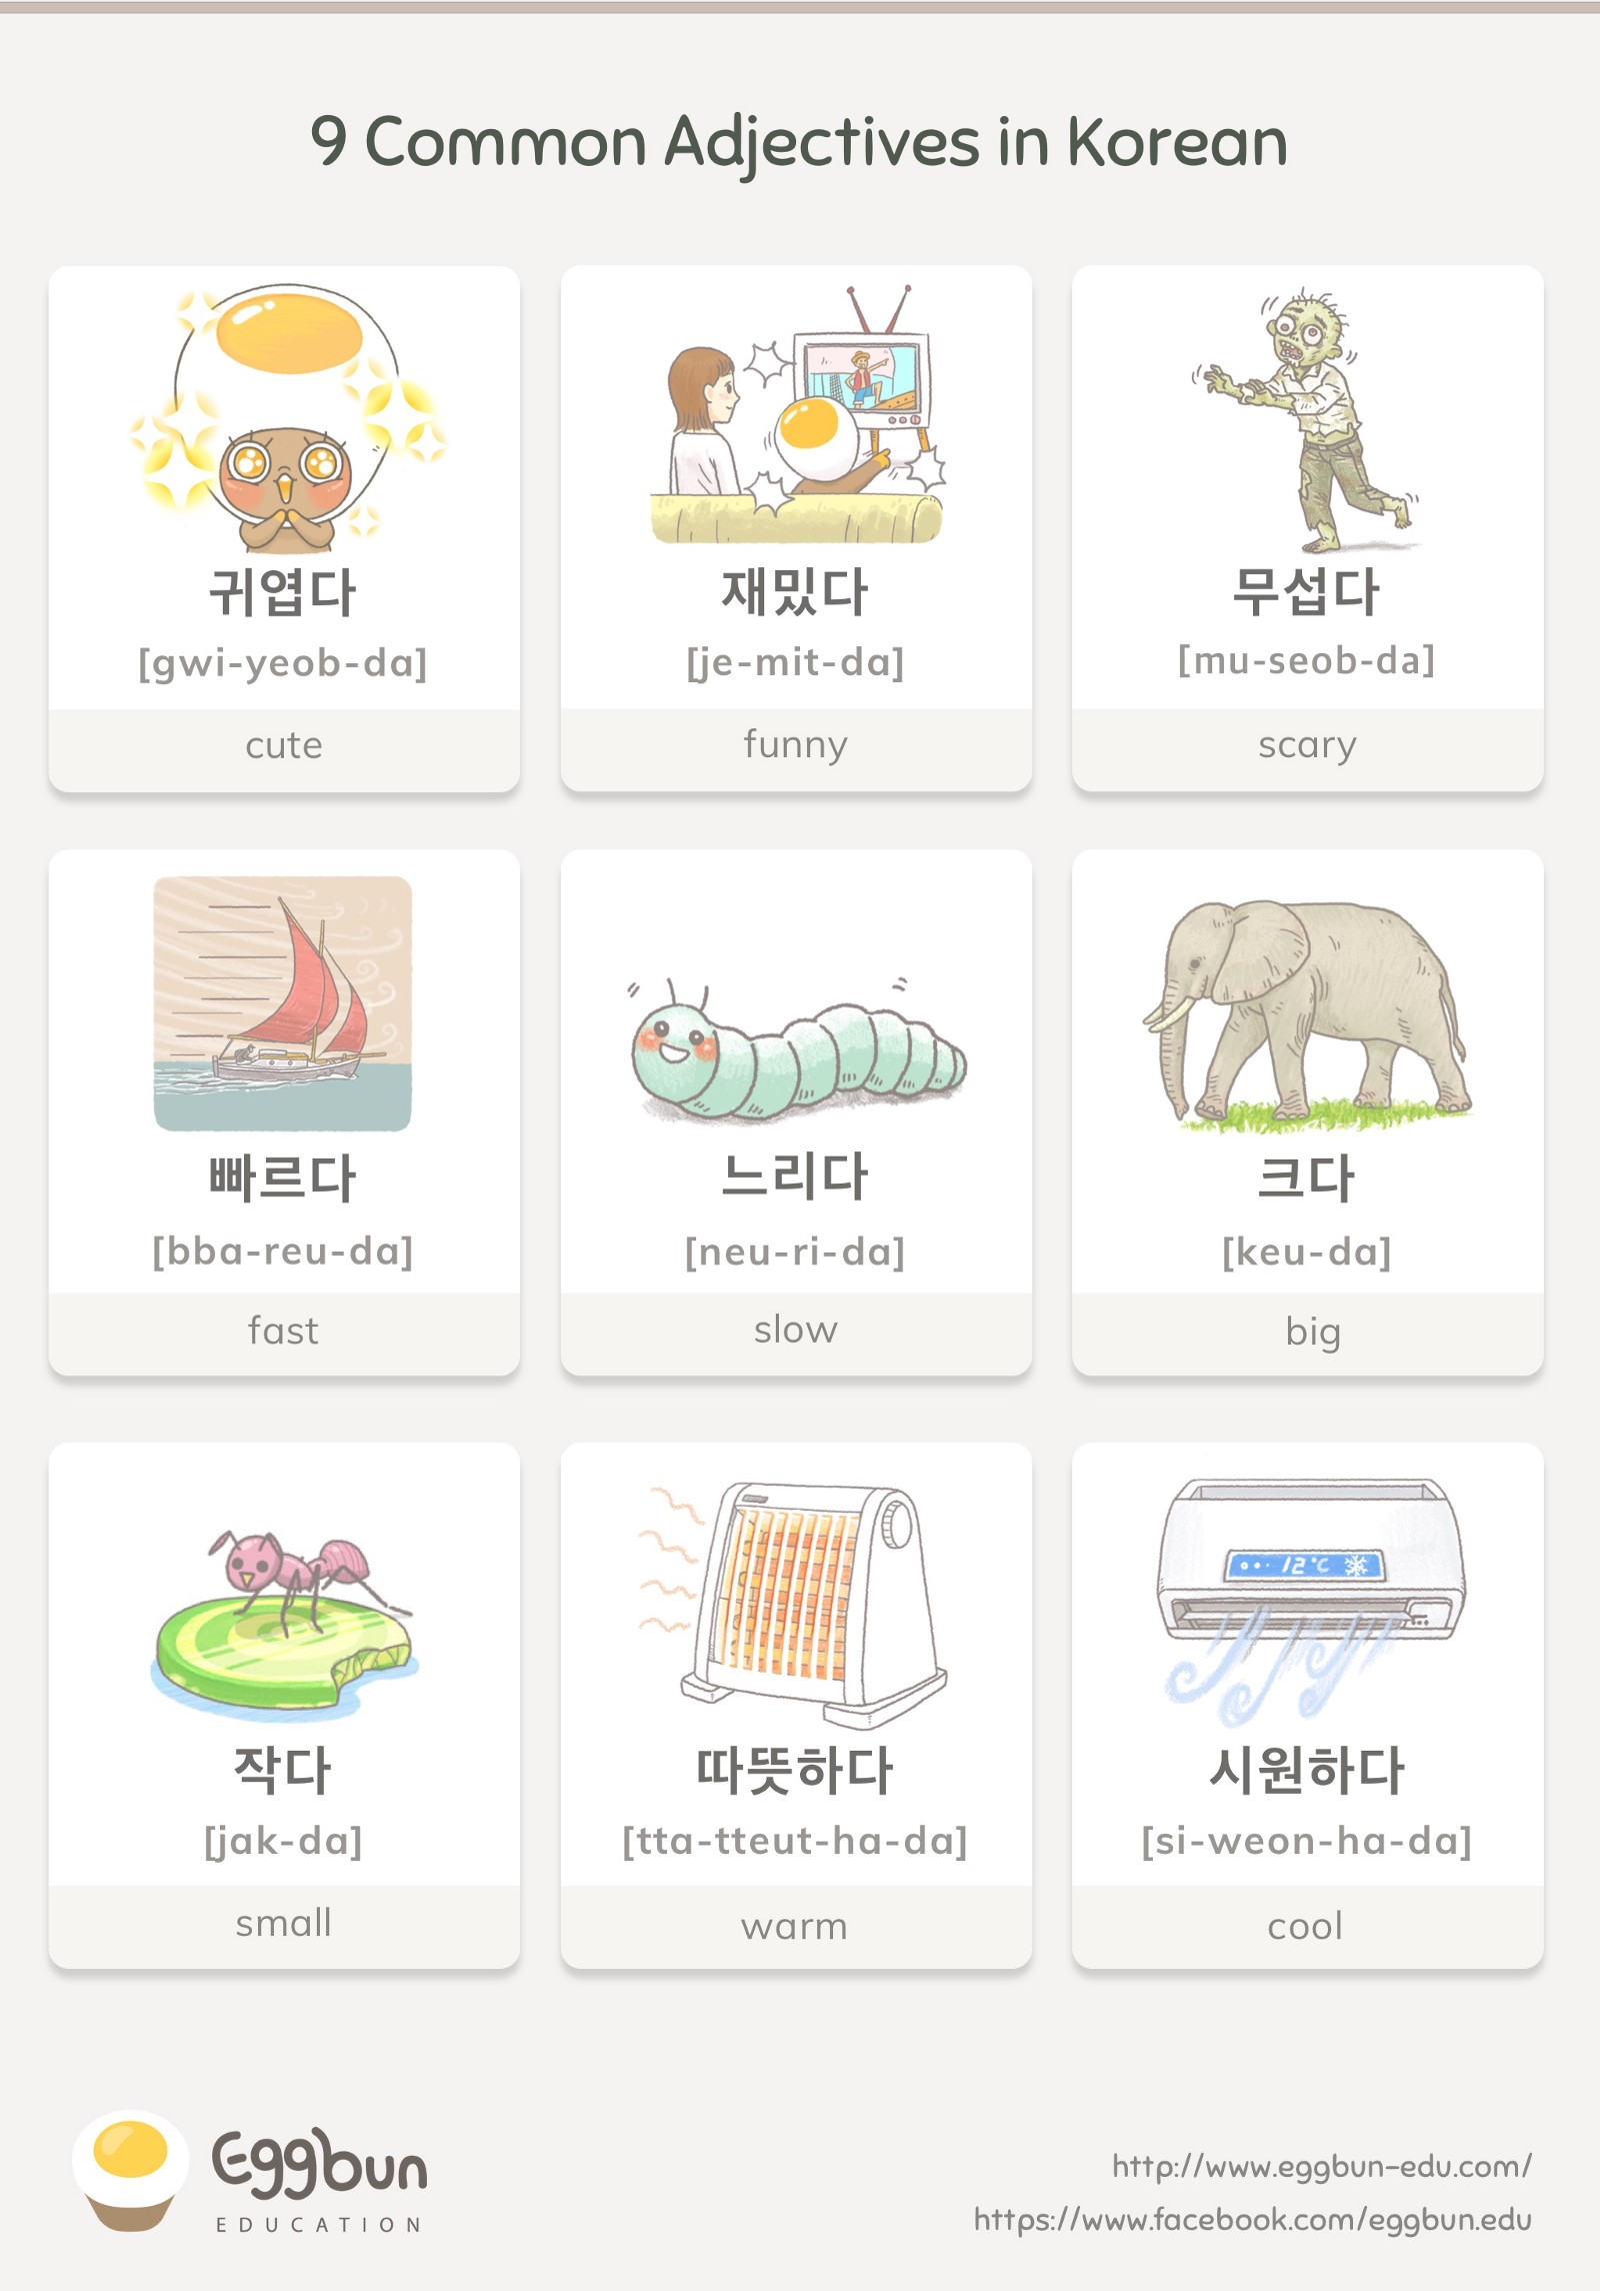 9 Common Adjectives In Korean Story Of Eggbun Education